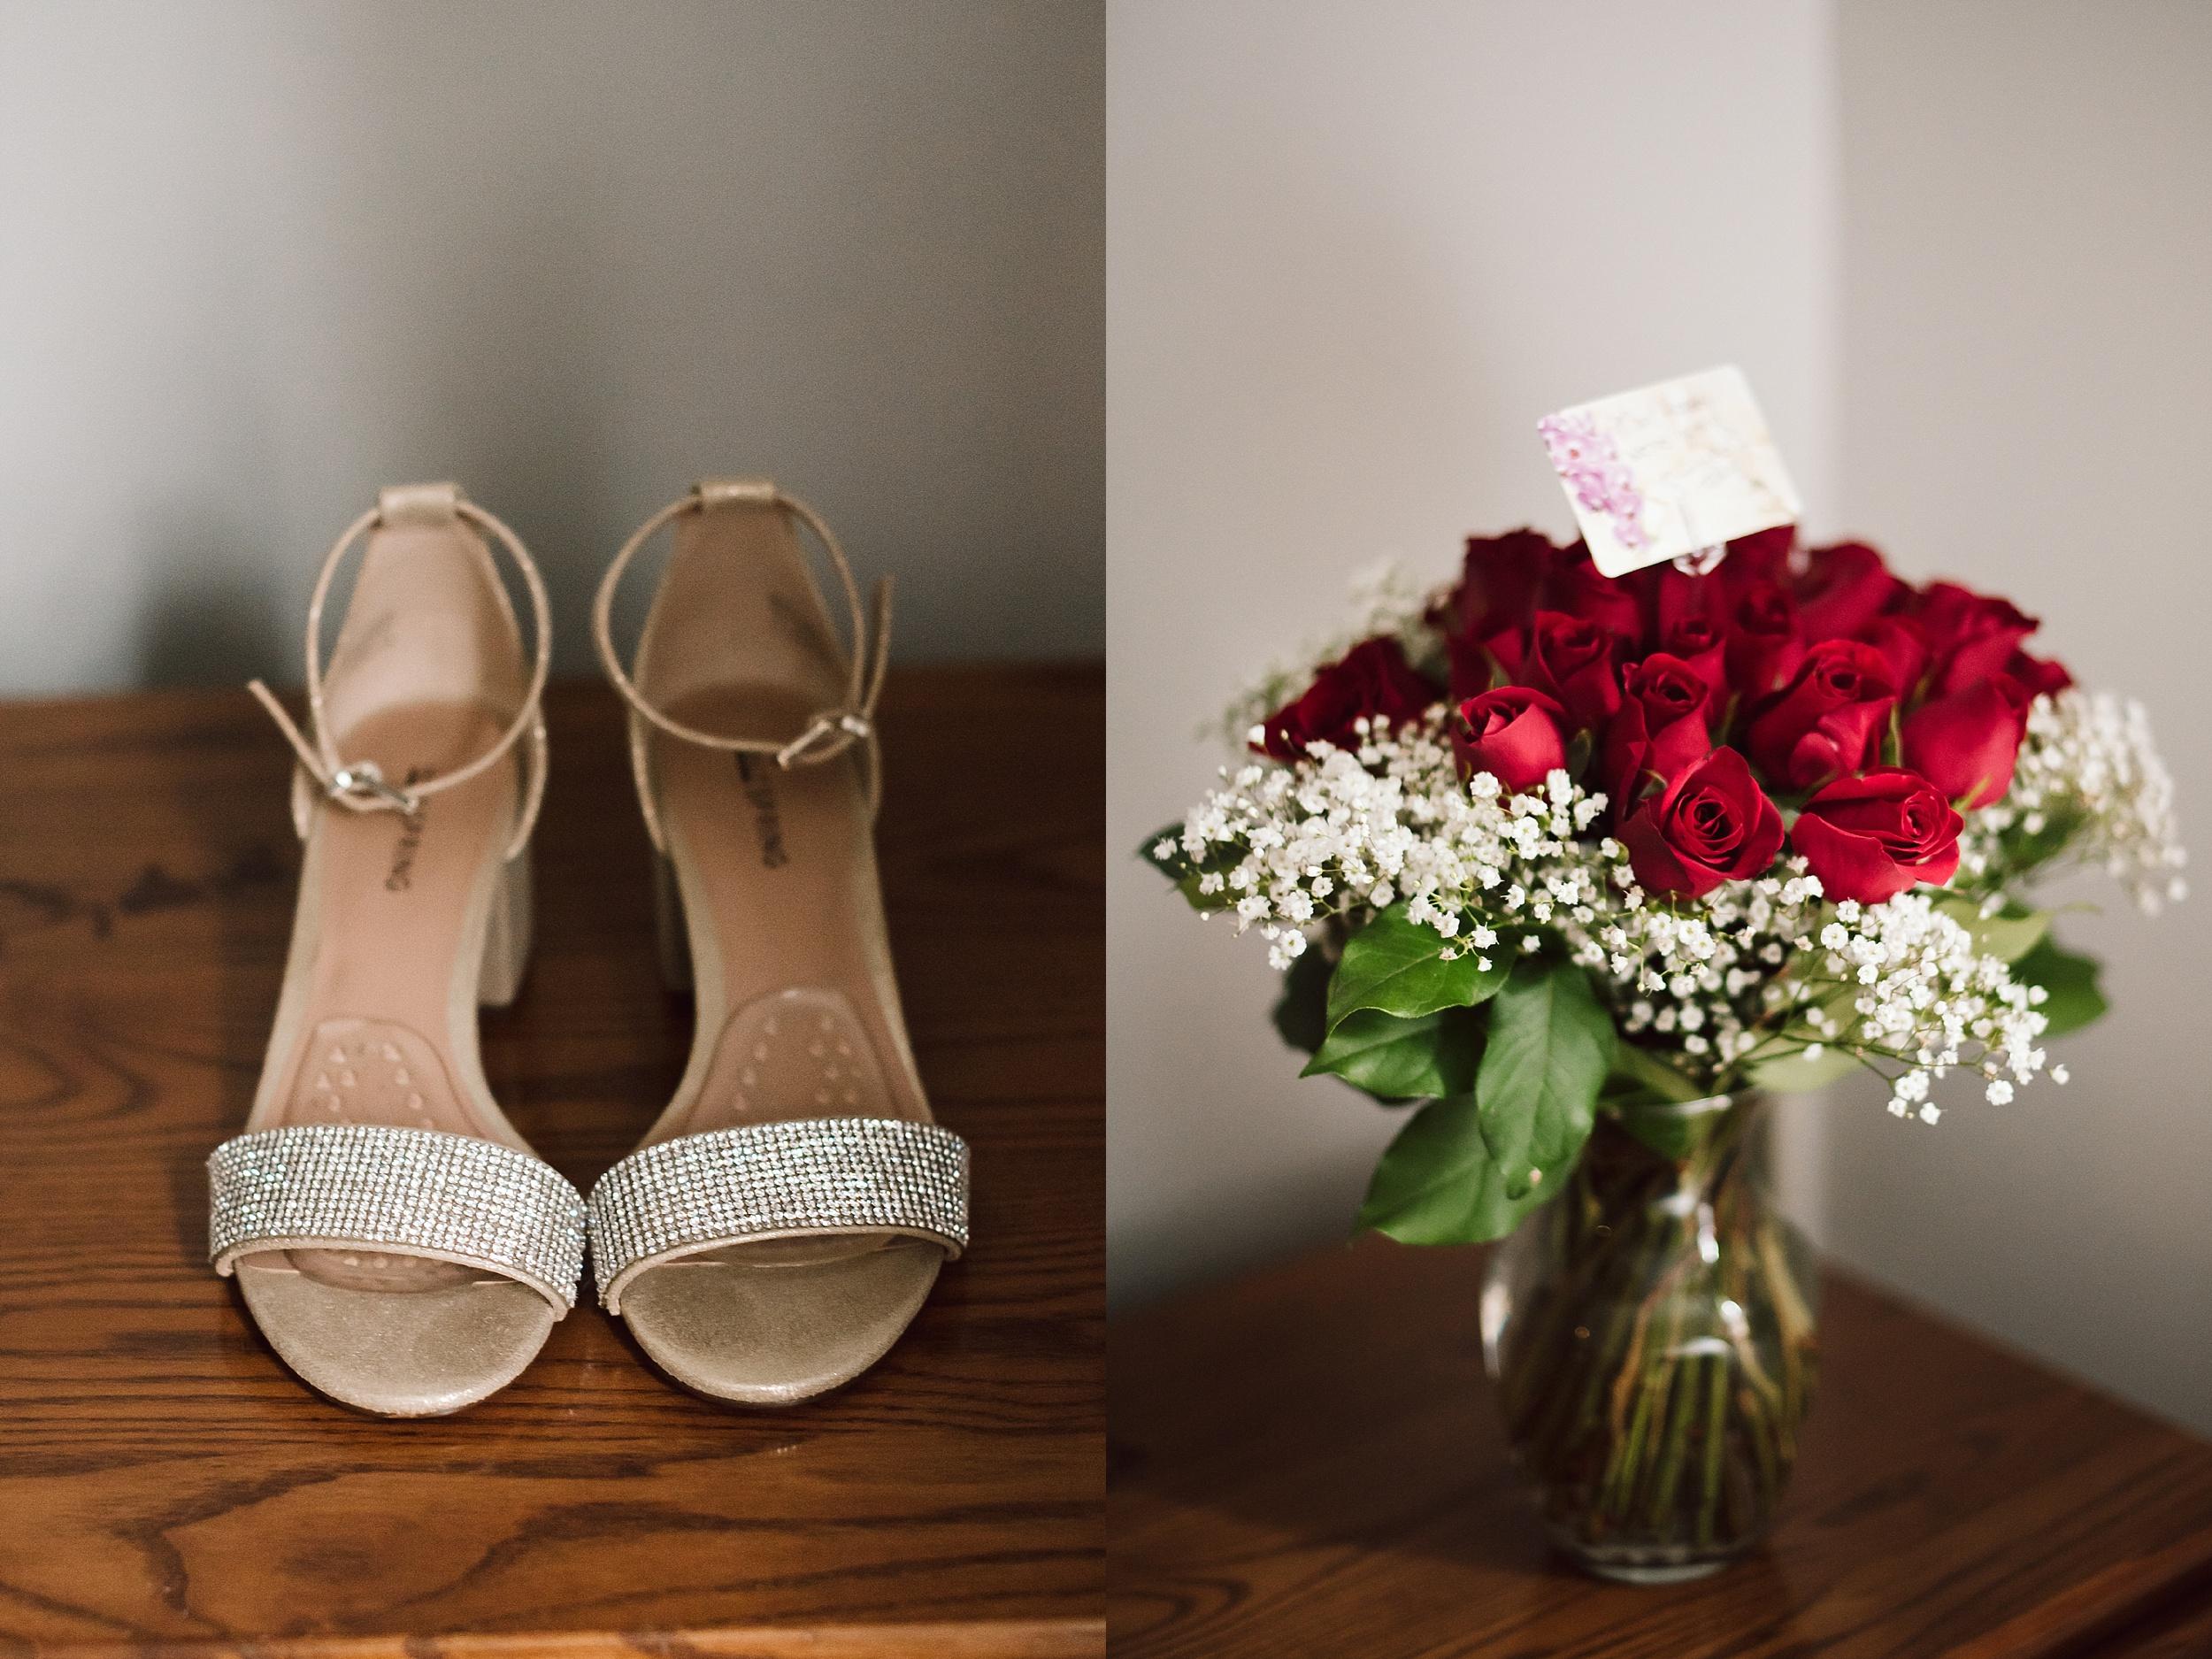 Fox_Photography_Destination_Wedding_Photographer_Primrose_Hill_Camden_0006.jpg